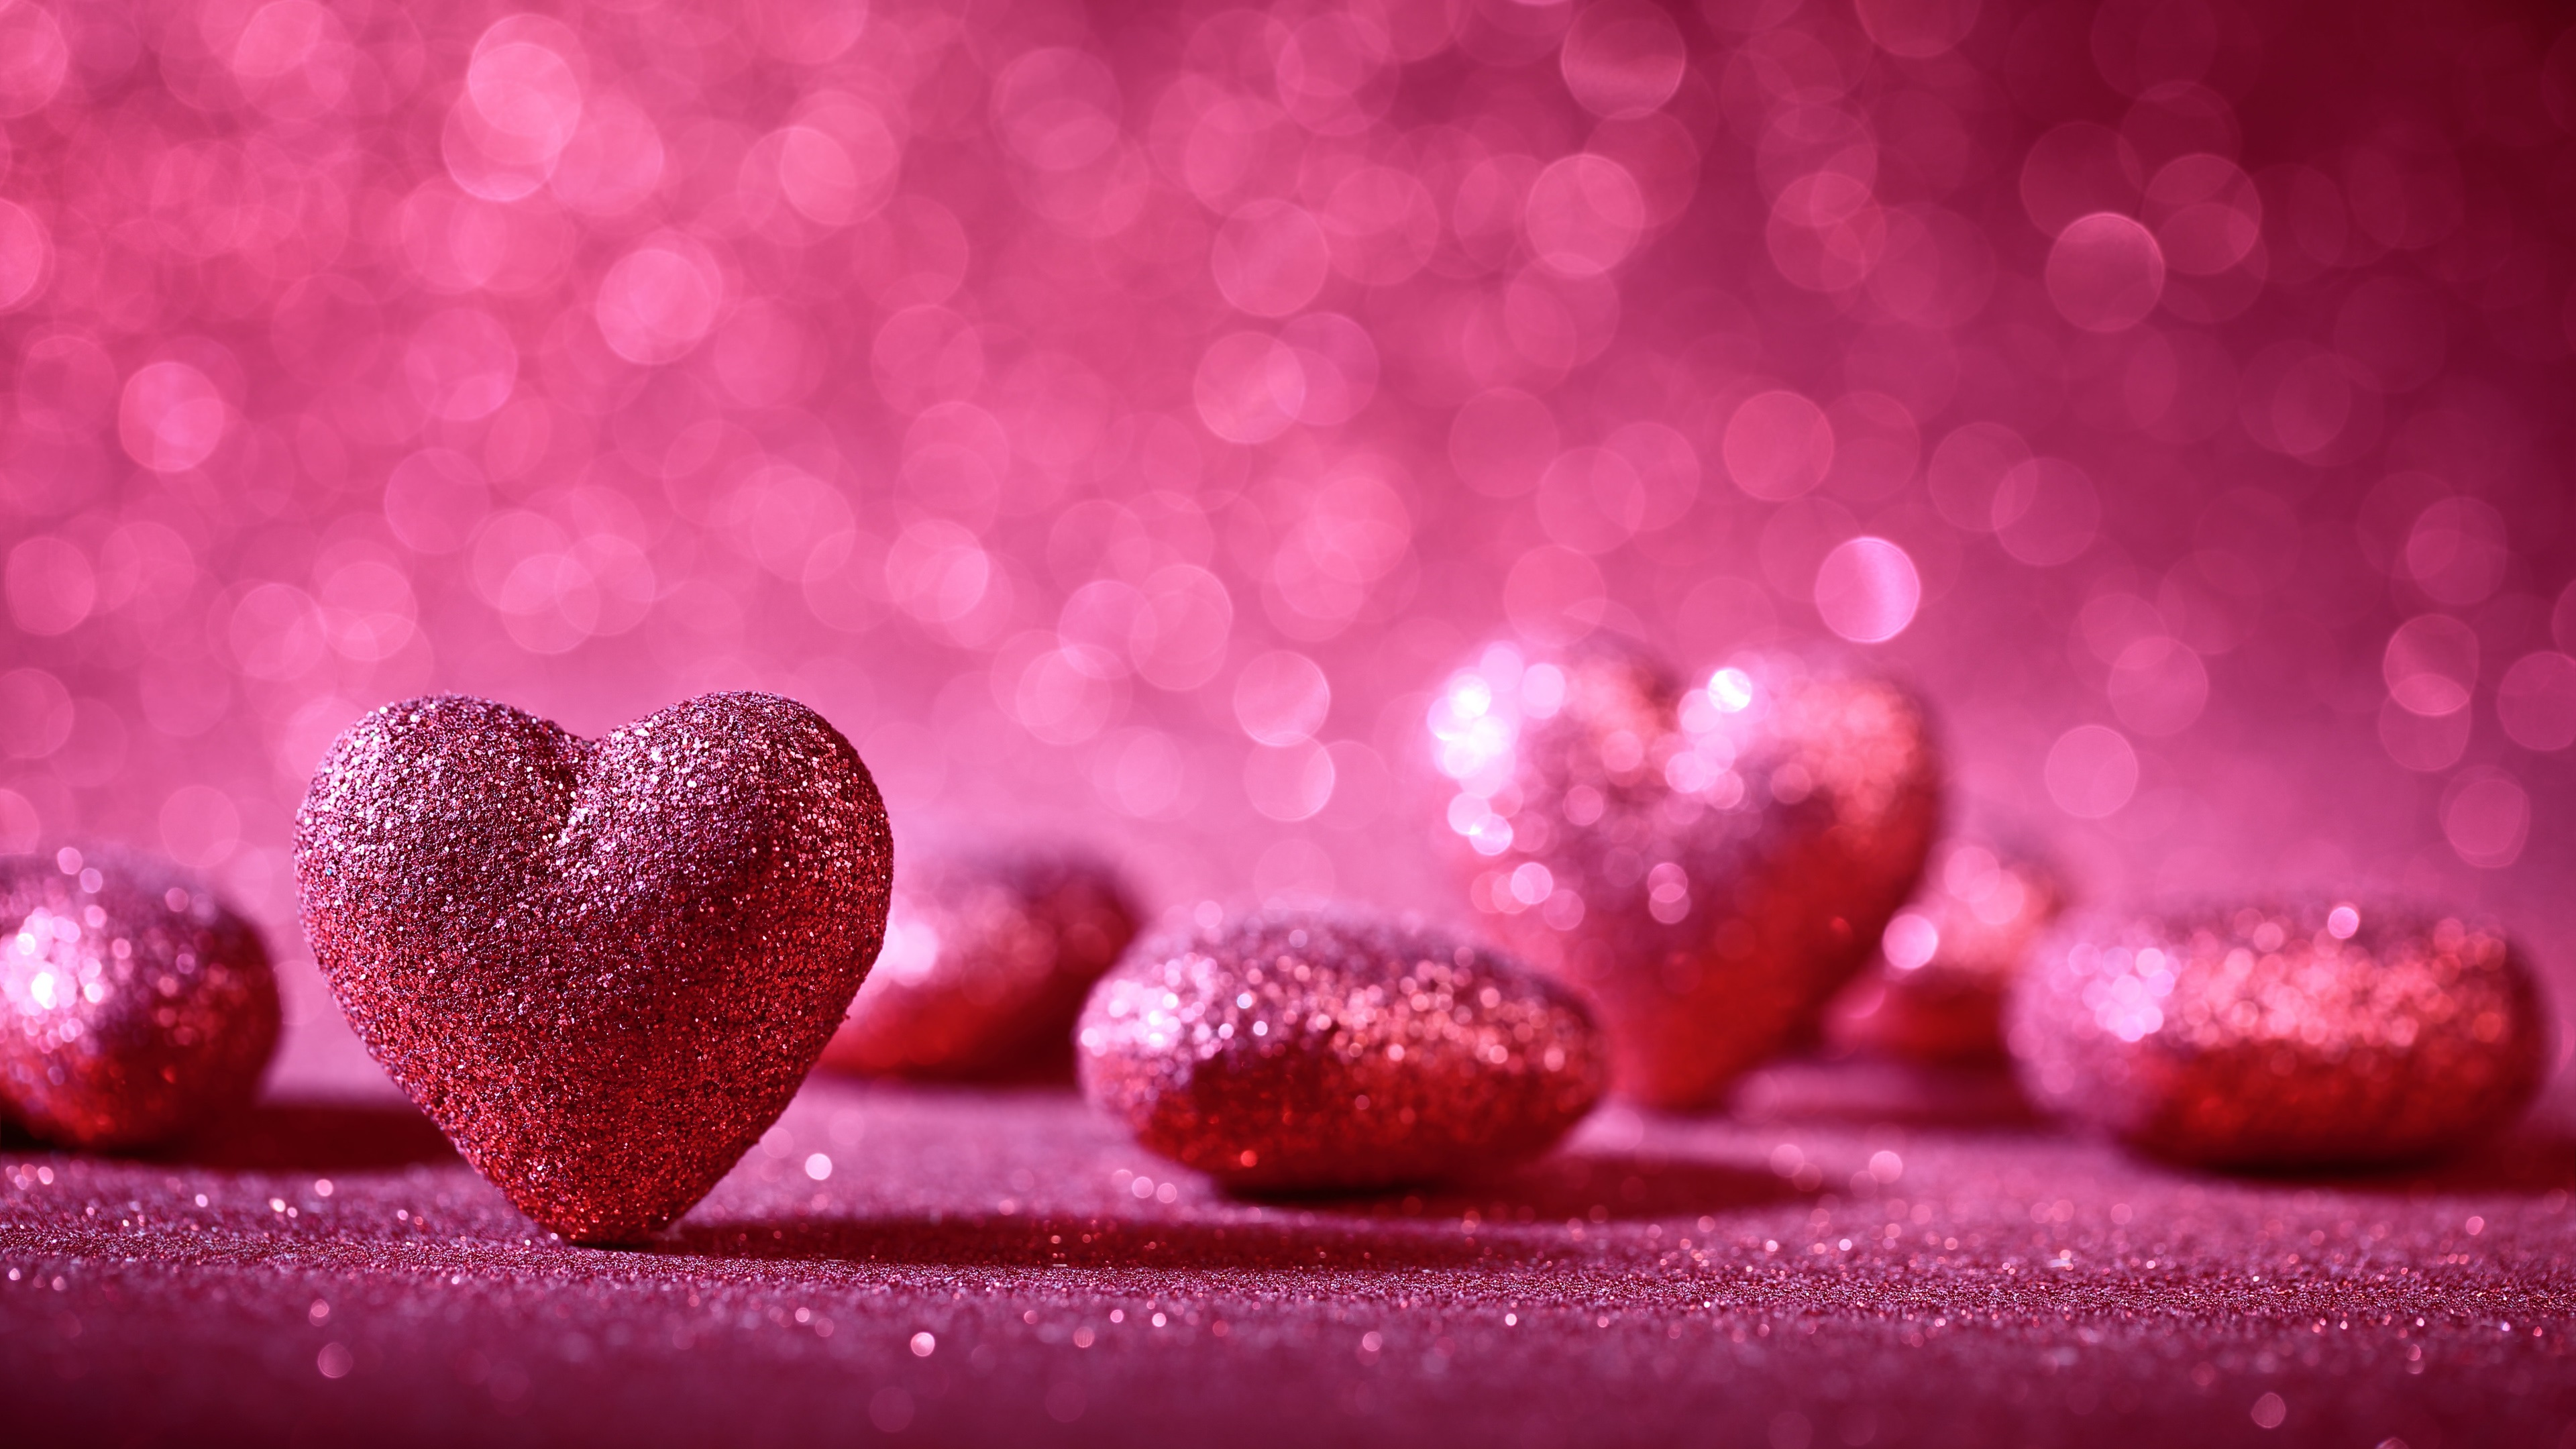 Обои сердце любовь картинки